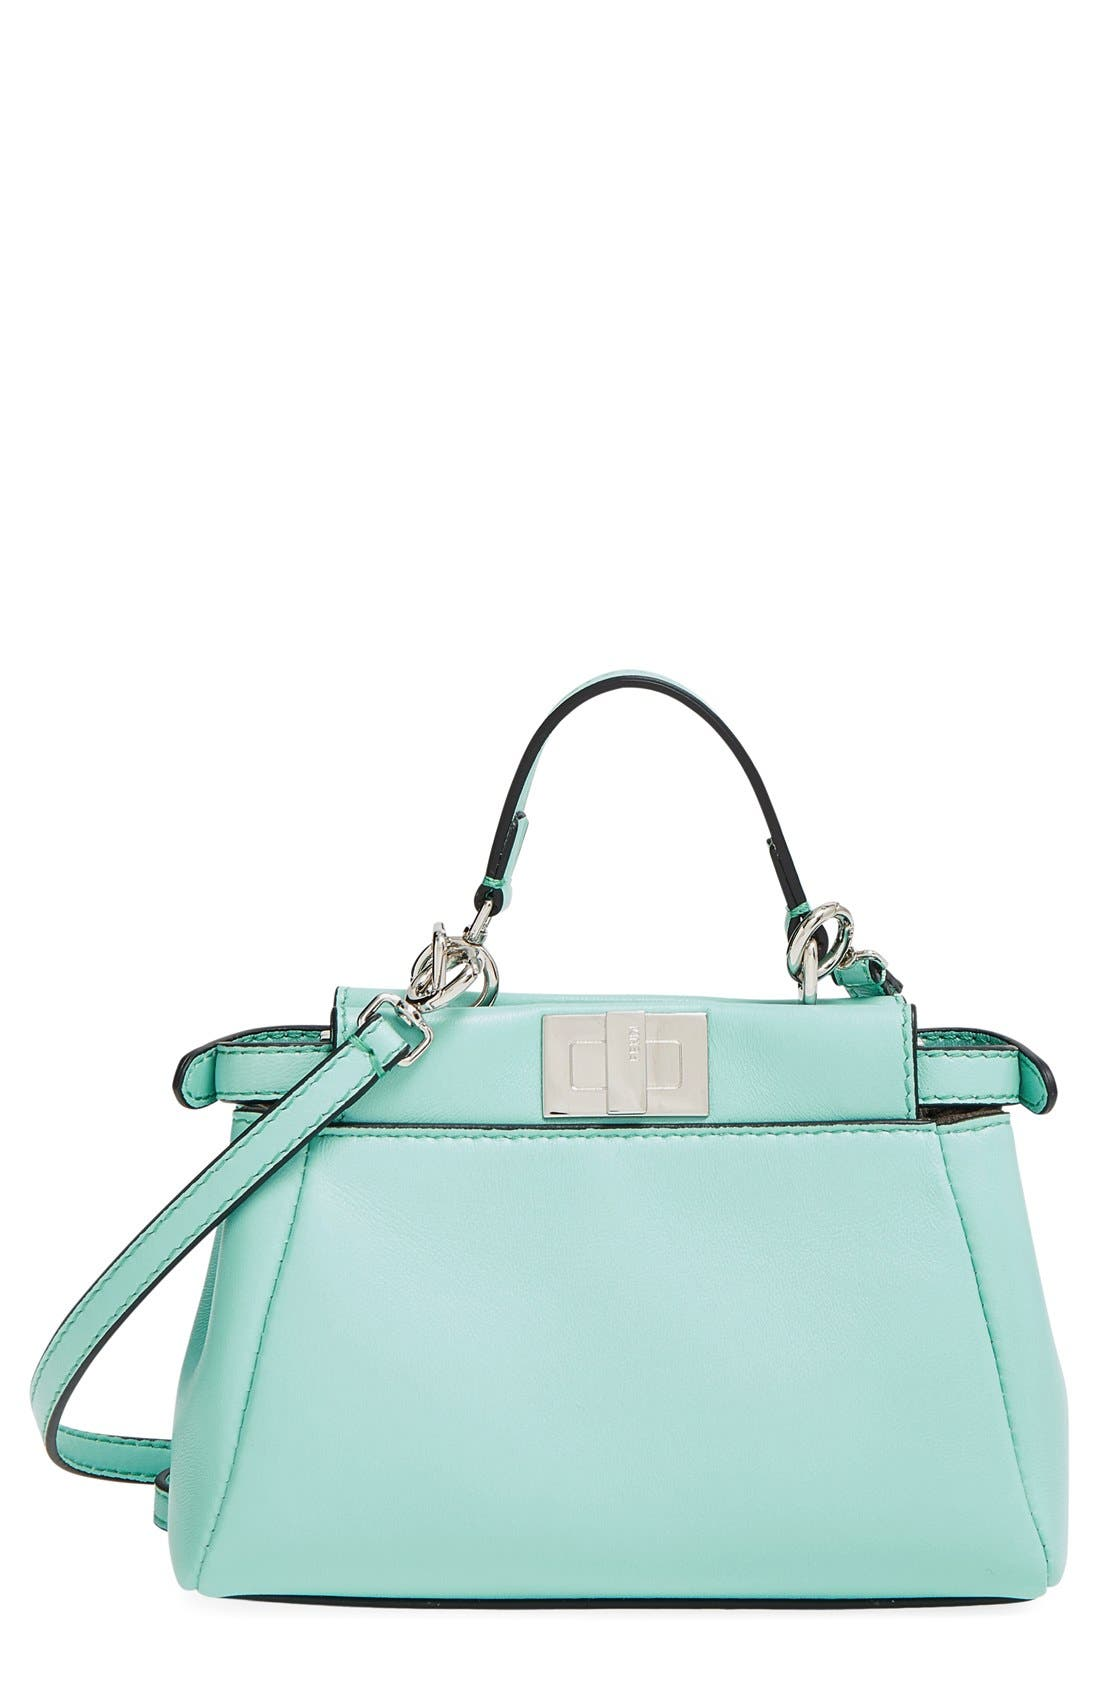 'Micro Peekaboo' Nappa Leather Bag,                             Main thumbnail 1, color,                             401